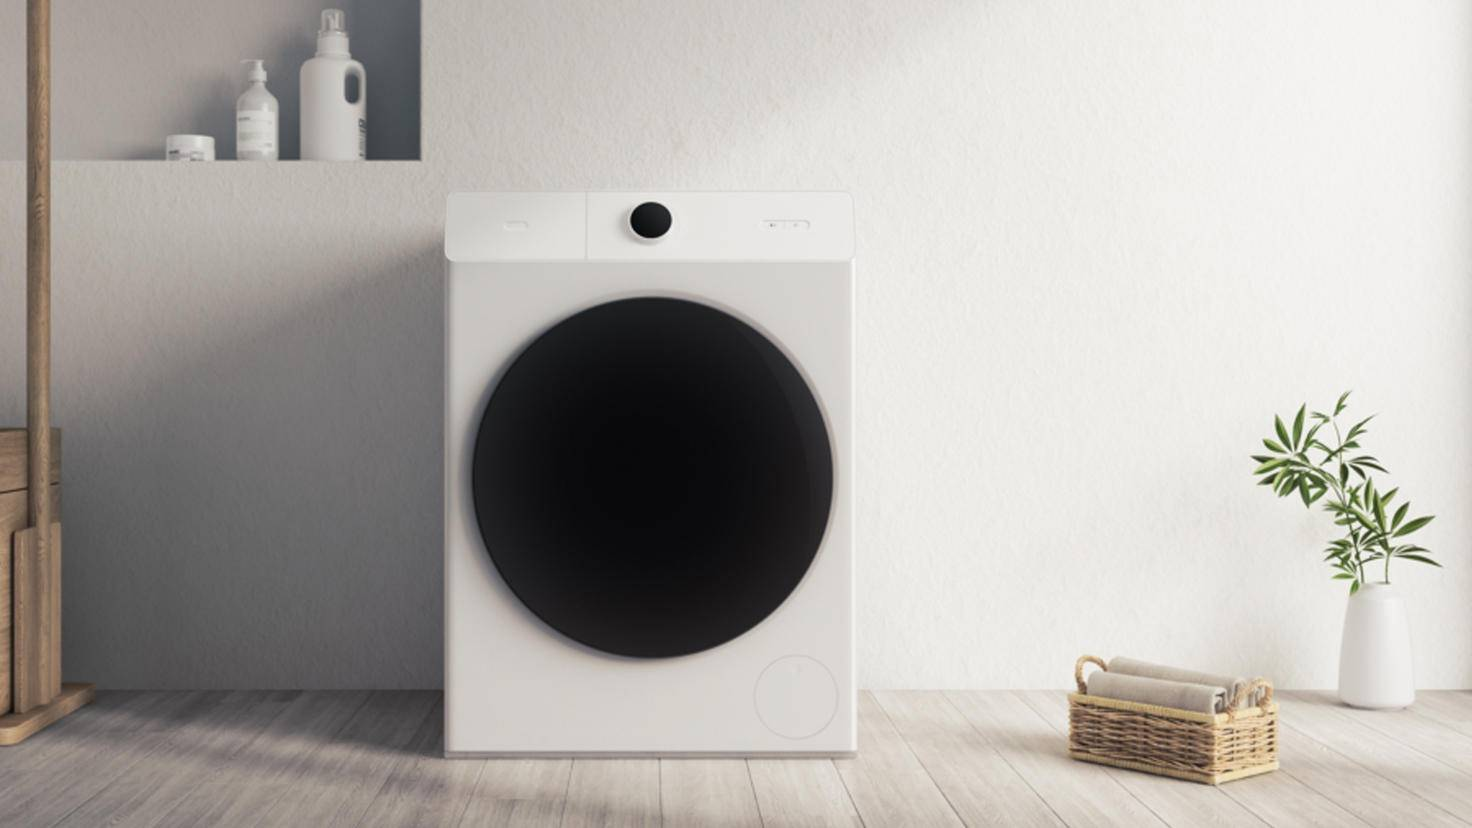 Mi Smart Combo Wash Dryer Pro Combo Washer Xiaomi